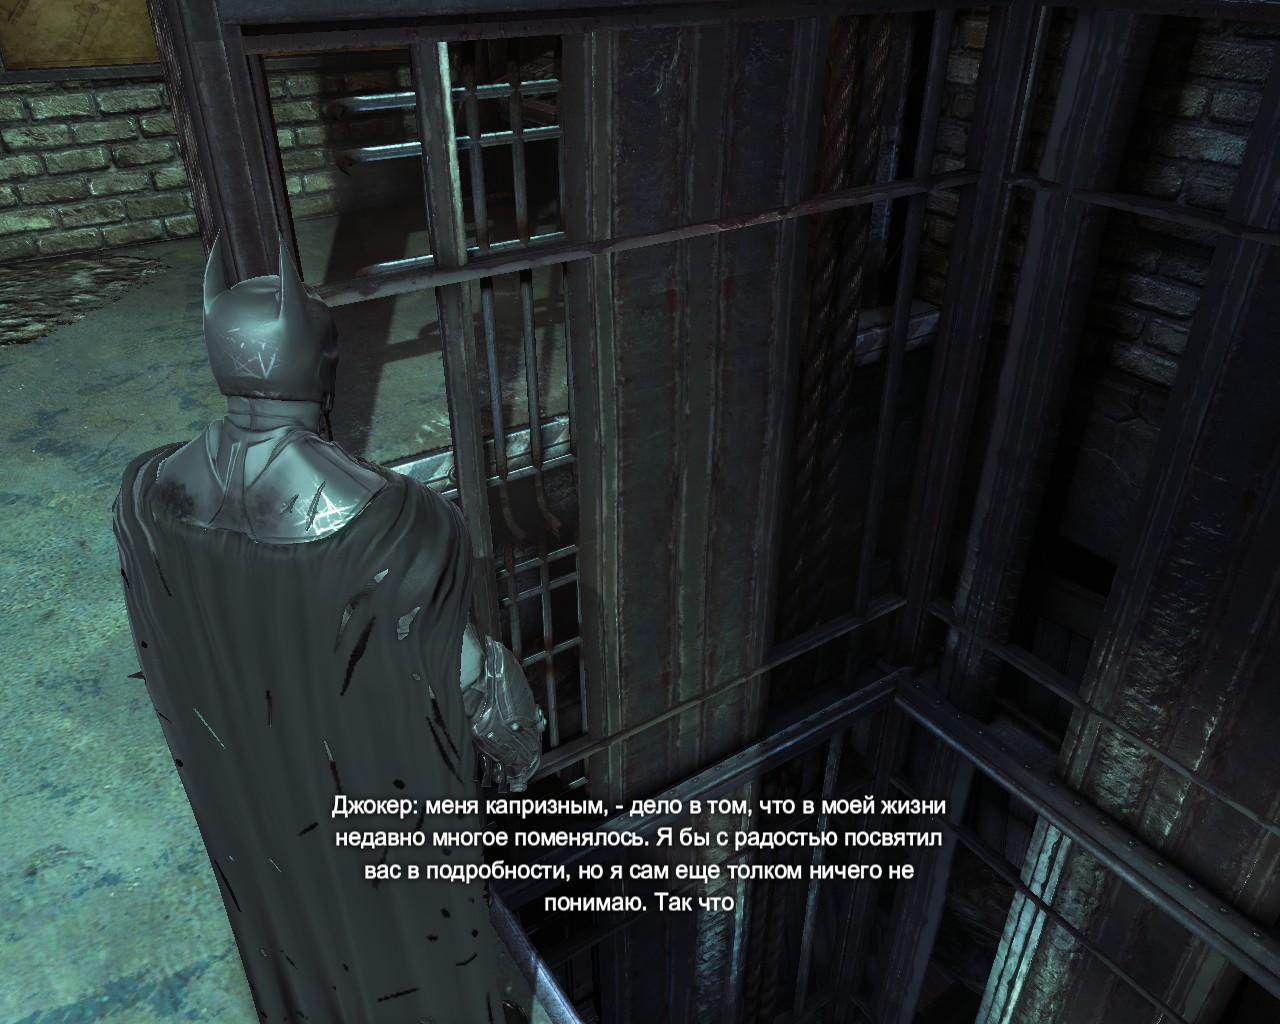 BatmanOrigins 2014-07-06 01-45-11-97.jpg - Batman: Arkham Origins